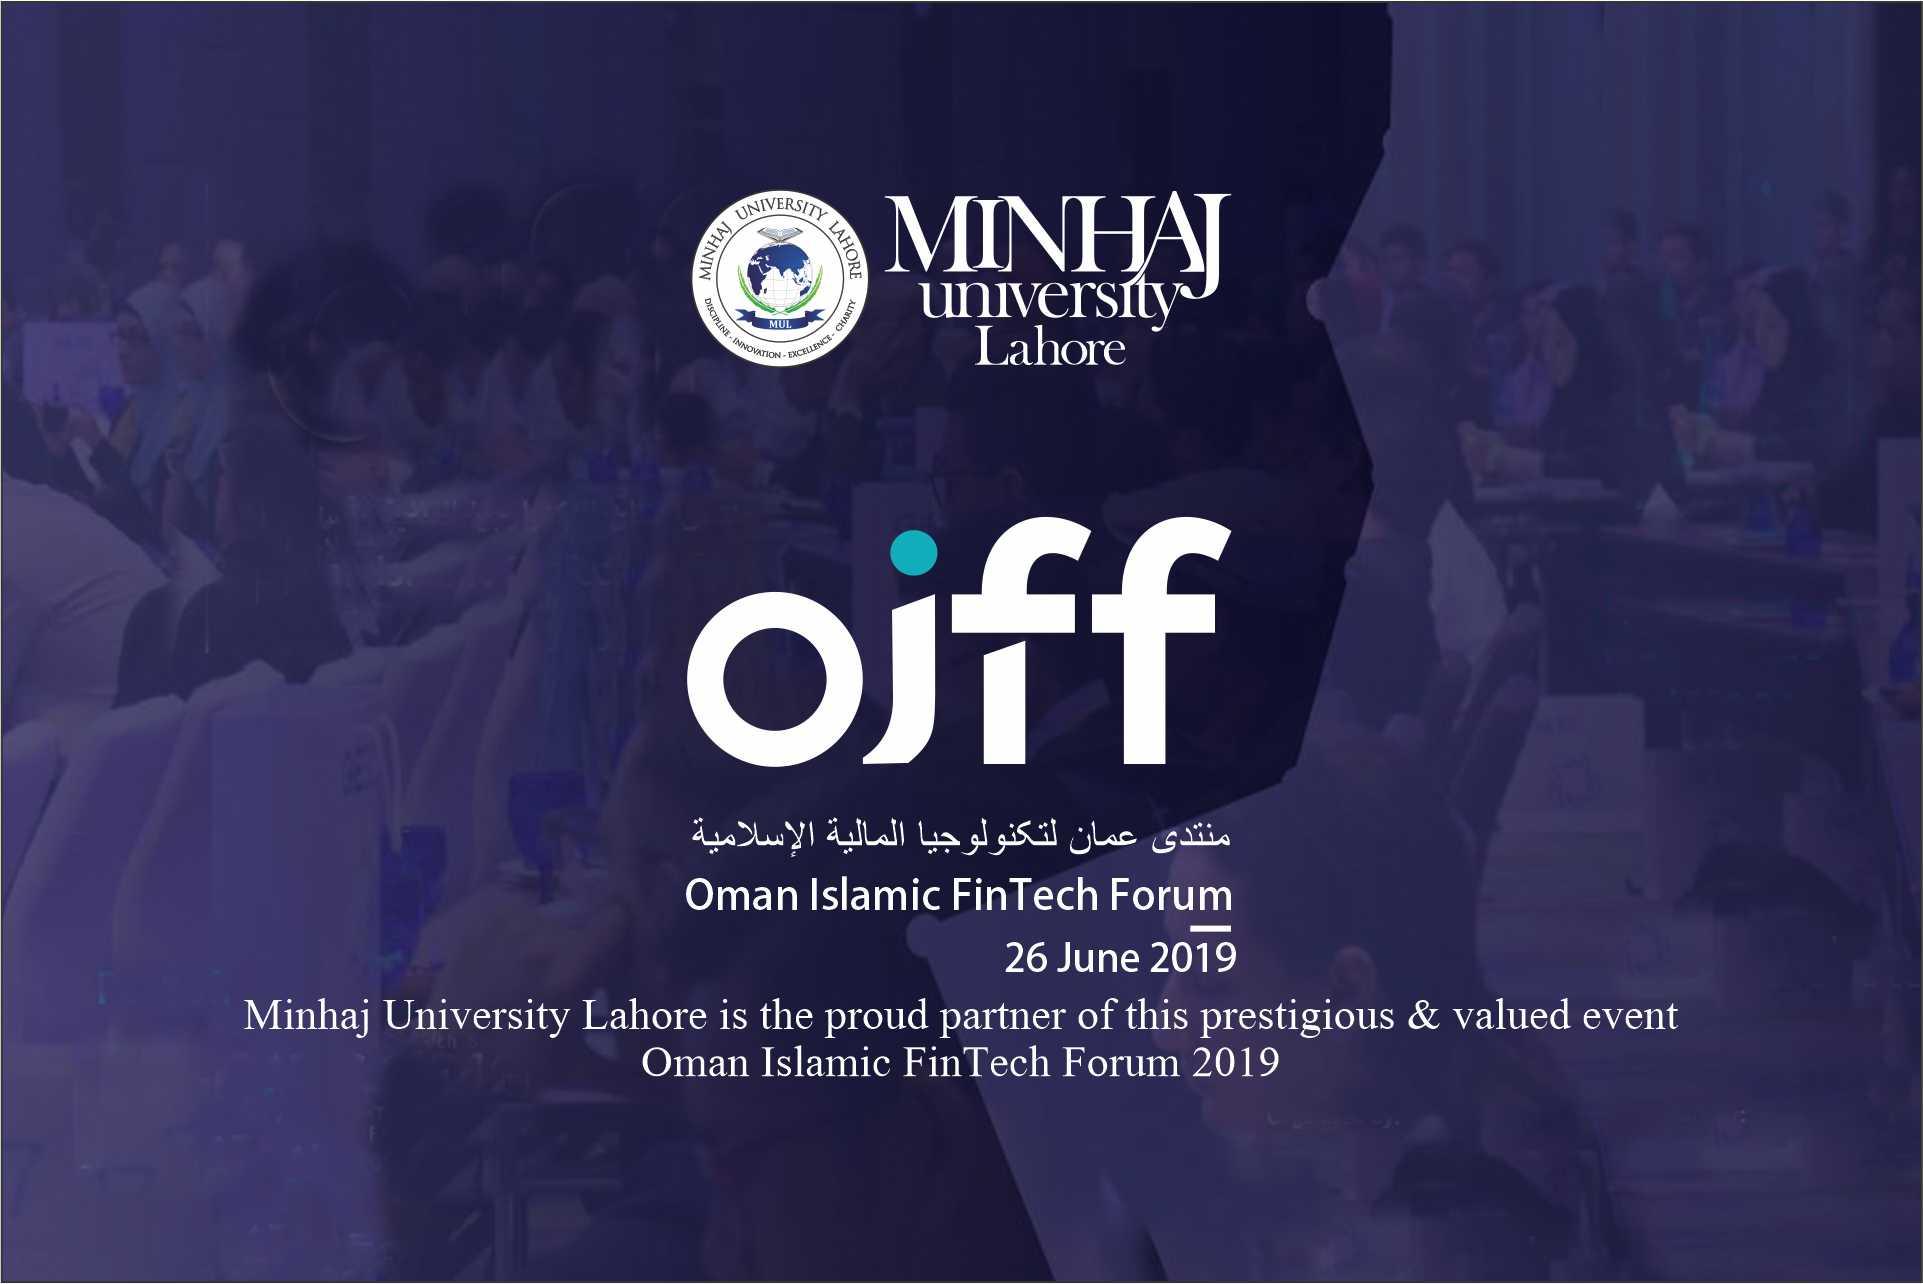 Proud Partner of Oman Islamic FinTech Forum